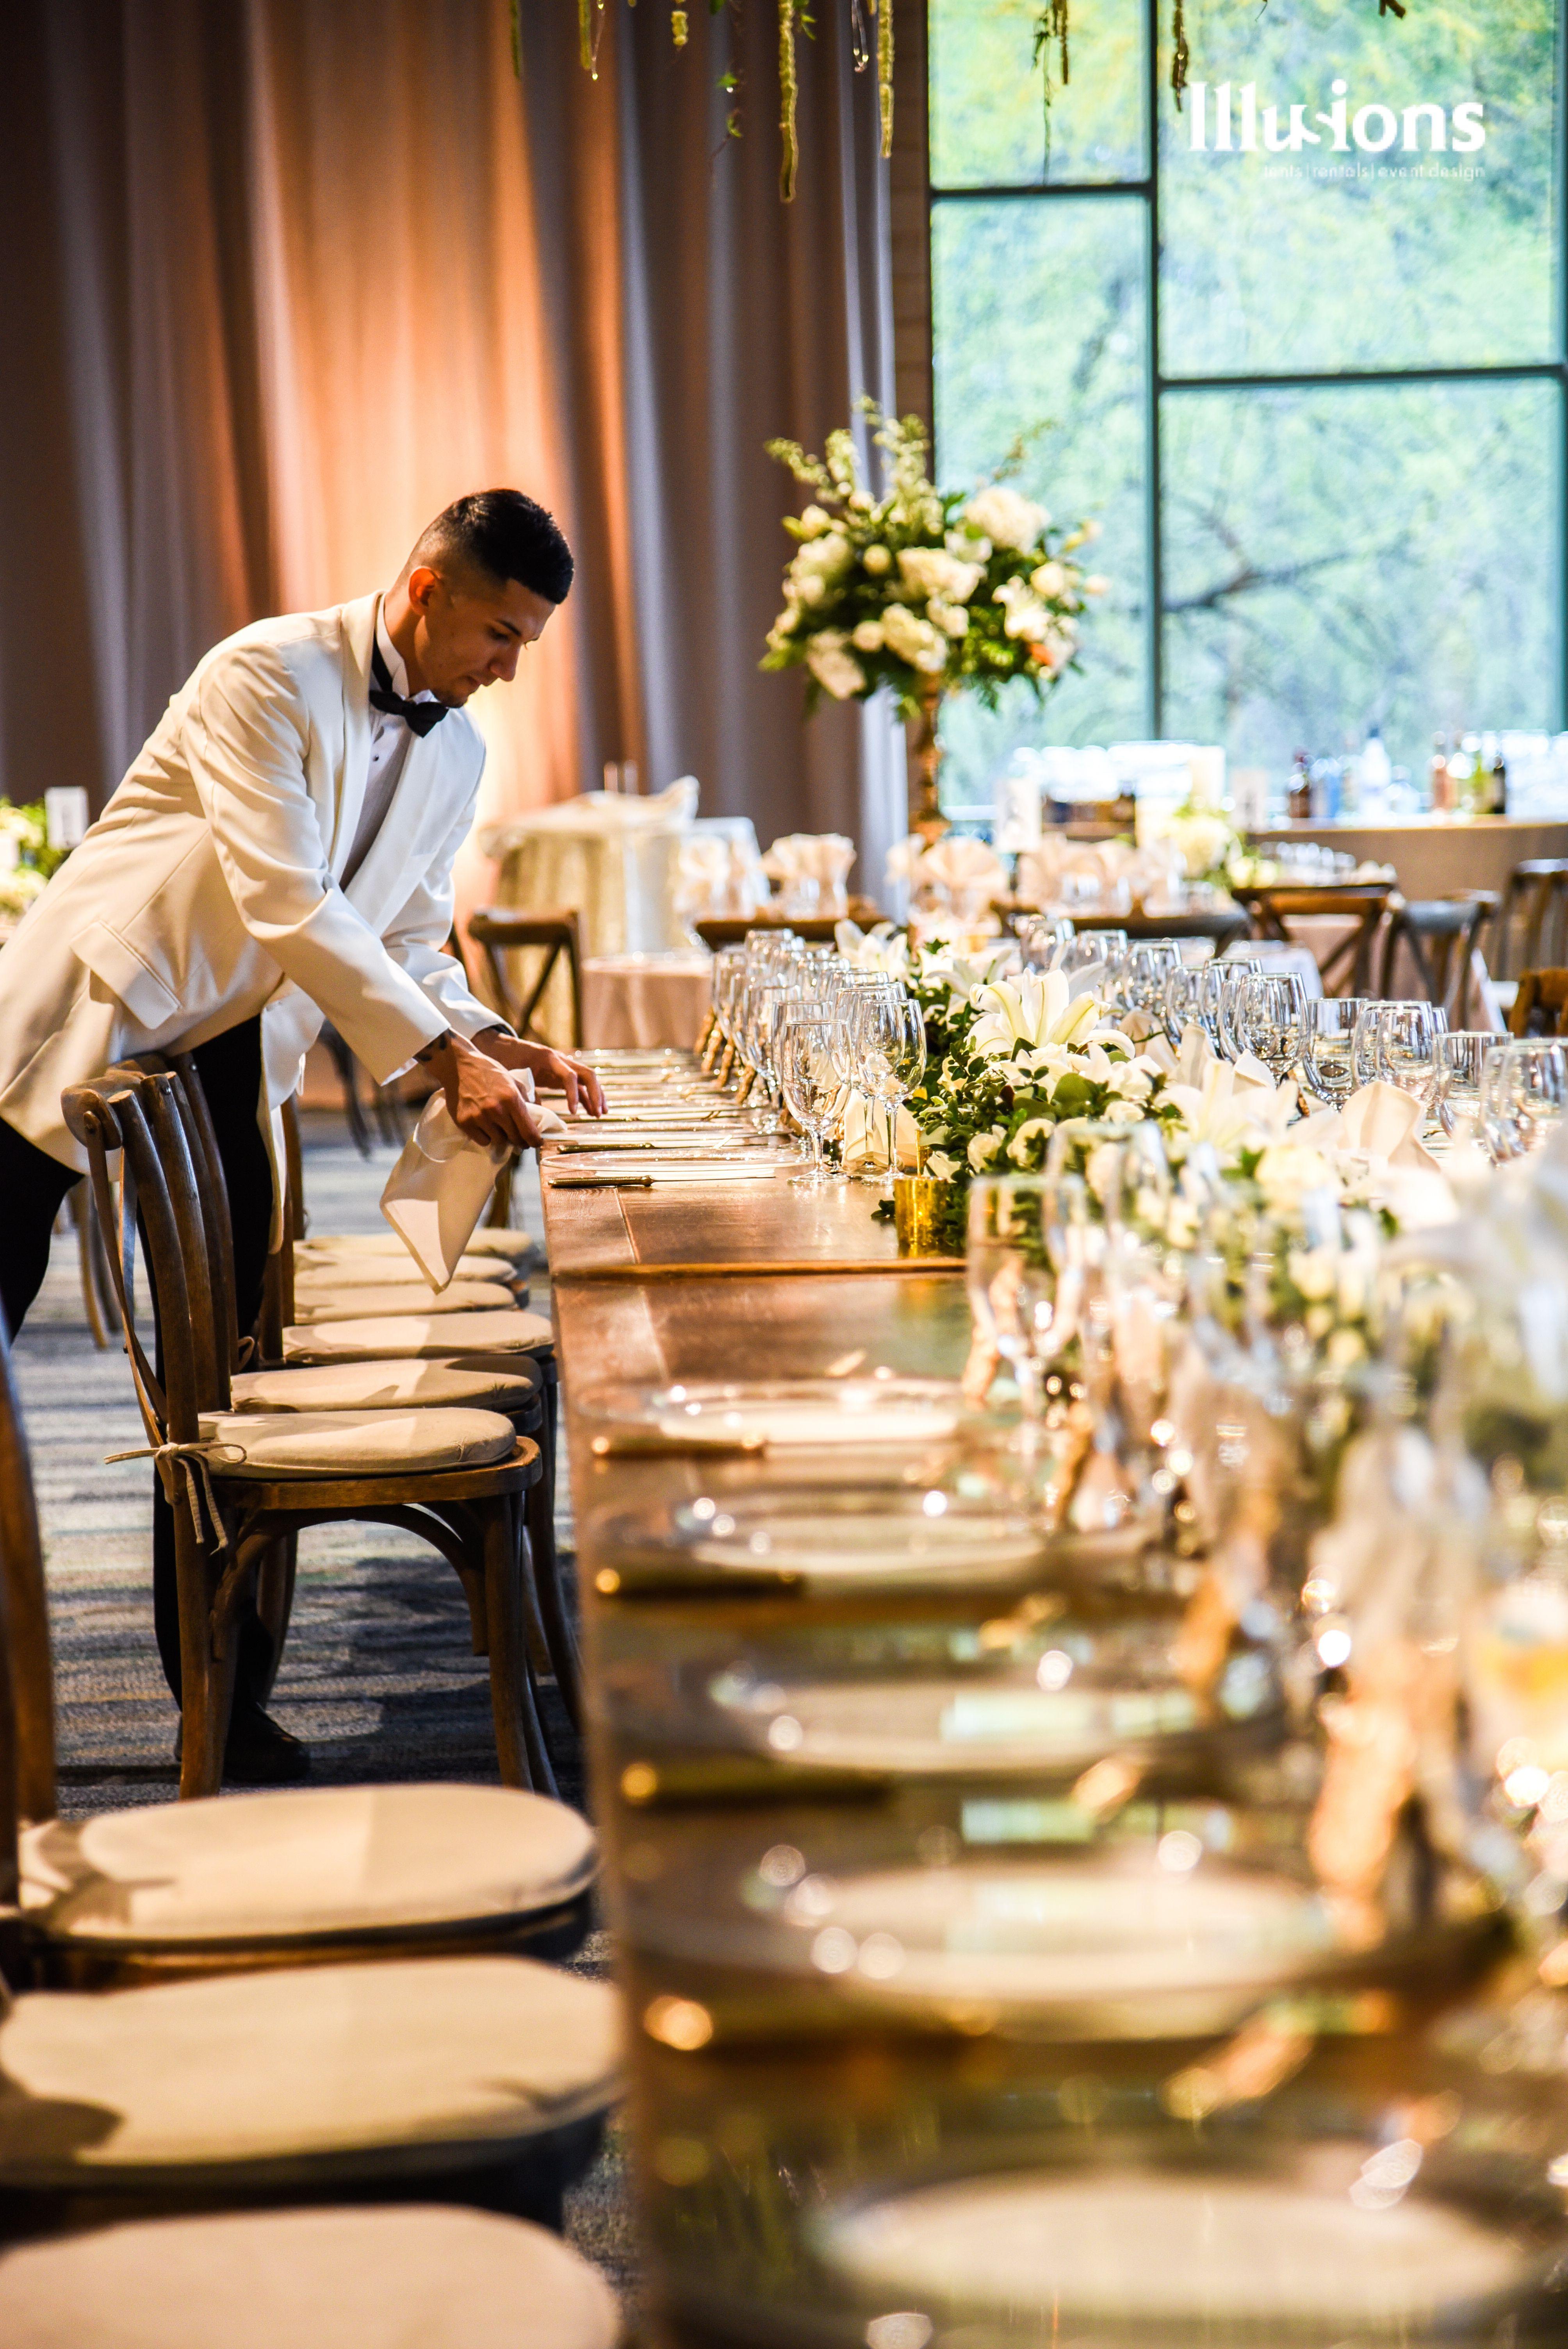 Pin By Illusions Event Rentals On Weddings Tent Rentals Wedding Rentals Dream Decor